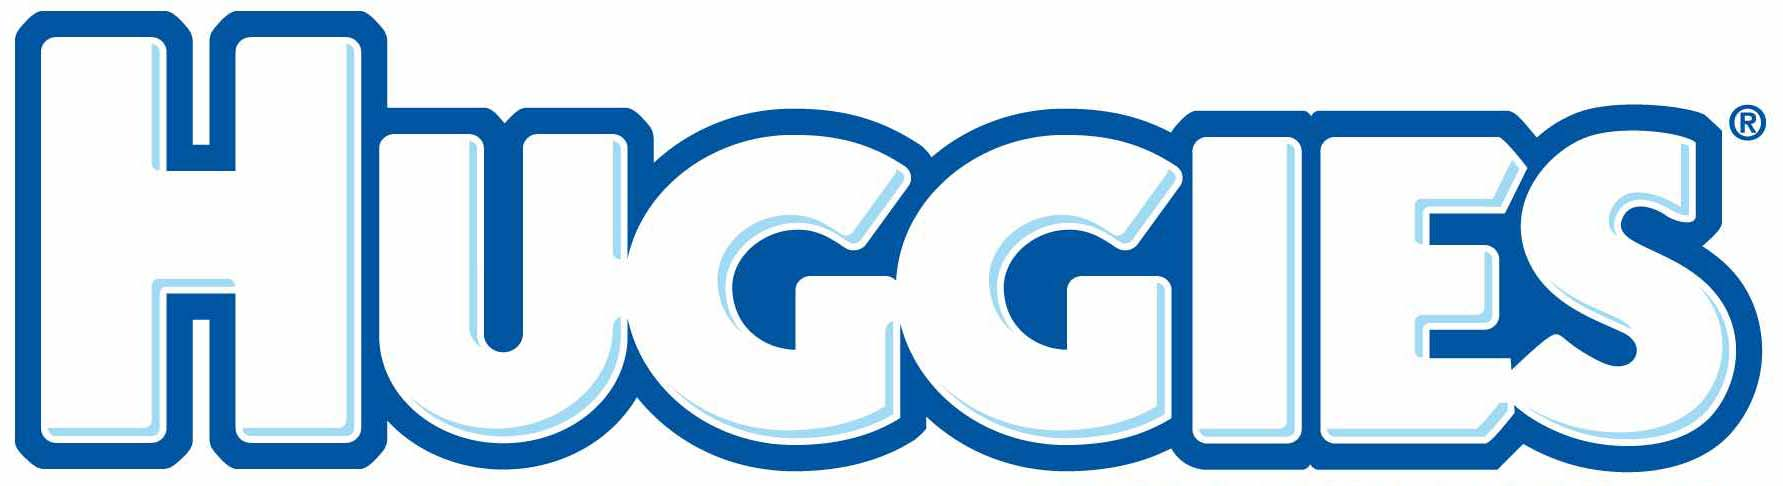 Huggies : Logopedia : Fandom powered by Wikia